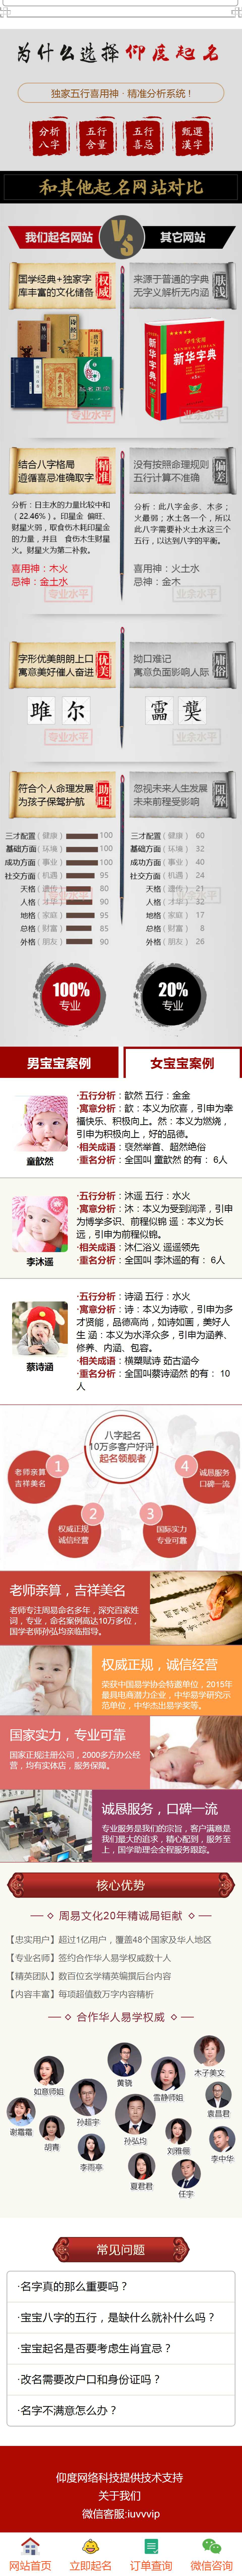 UI非常大气的宝宝起名网模板源码_带支付带手机版_非常适合做宝宝起名竞价项目 模板 第8张